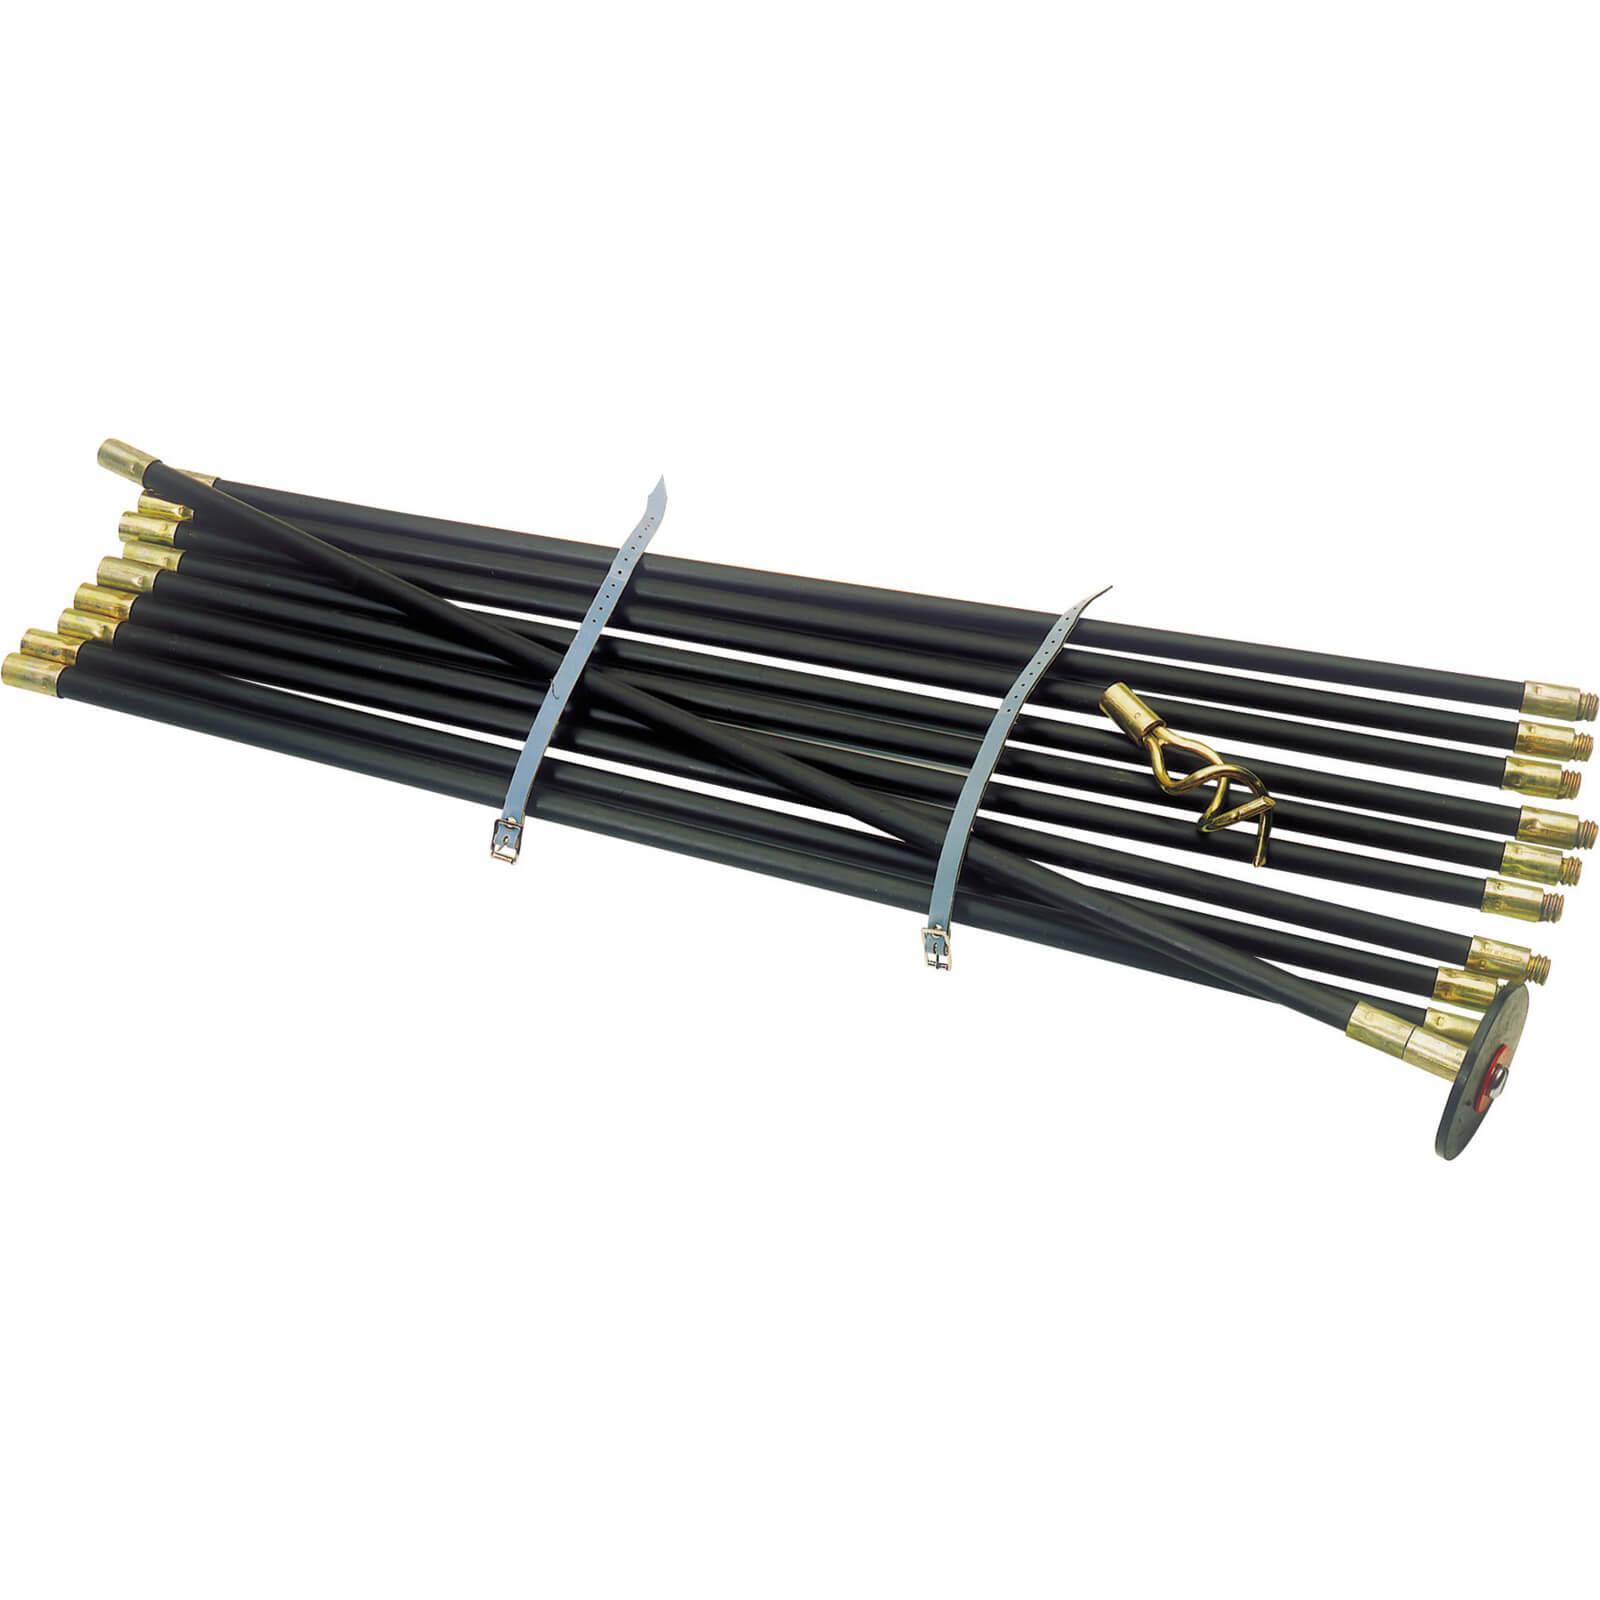 Image of Draper 12 Piece Drain Rod Set